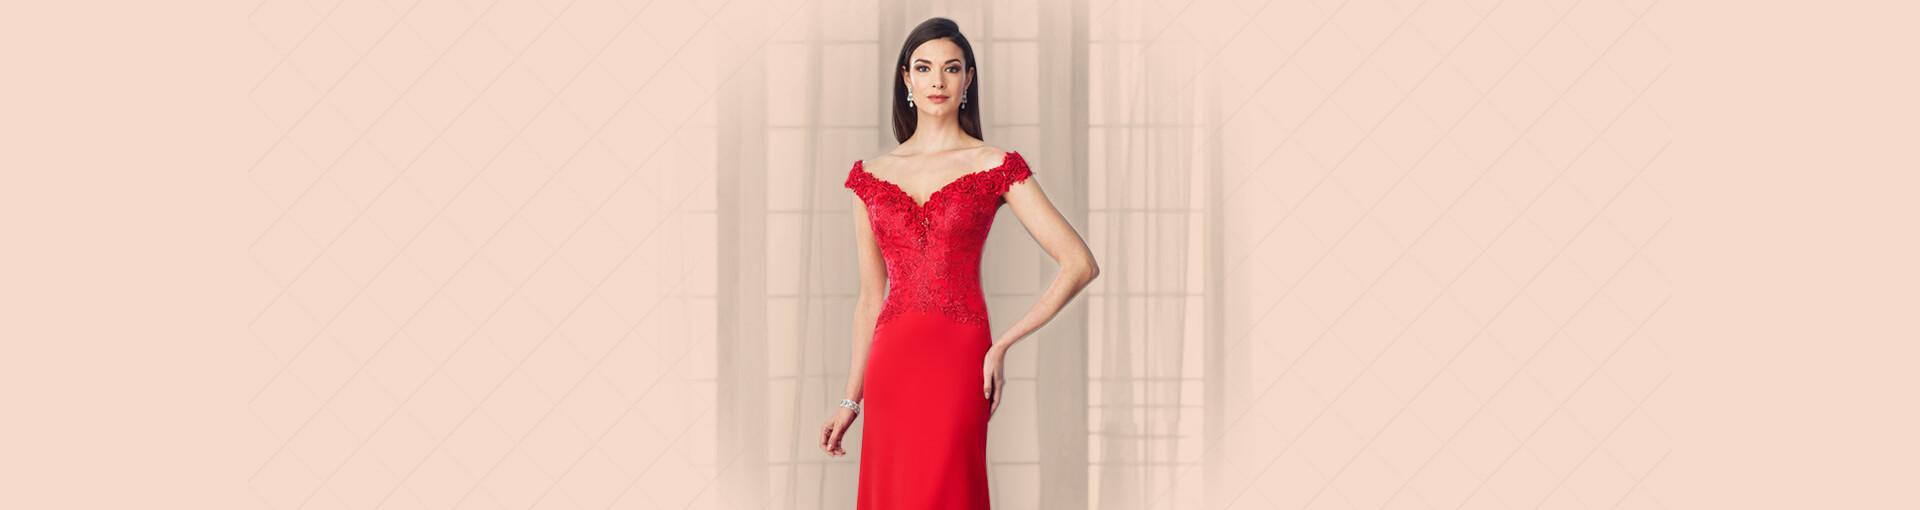 Robes élégantes France: Magasin de robe de bal outaouais